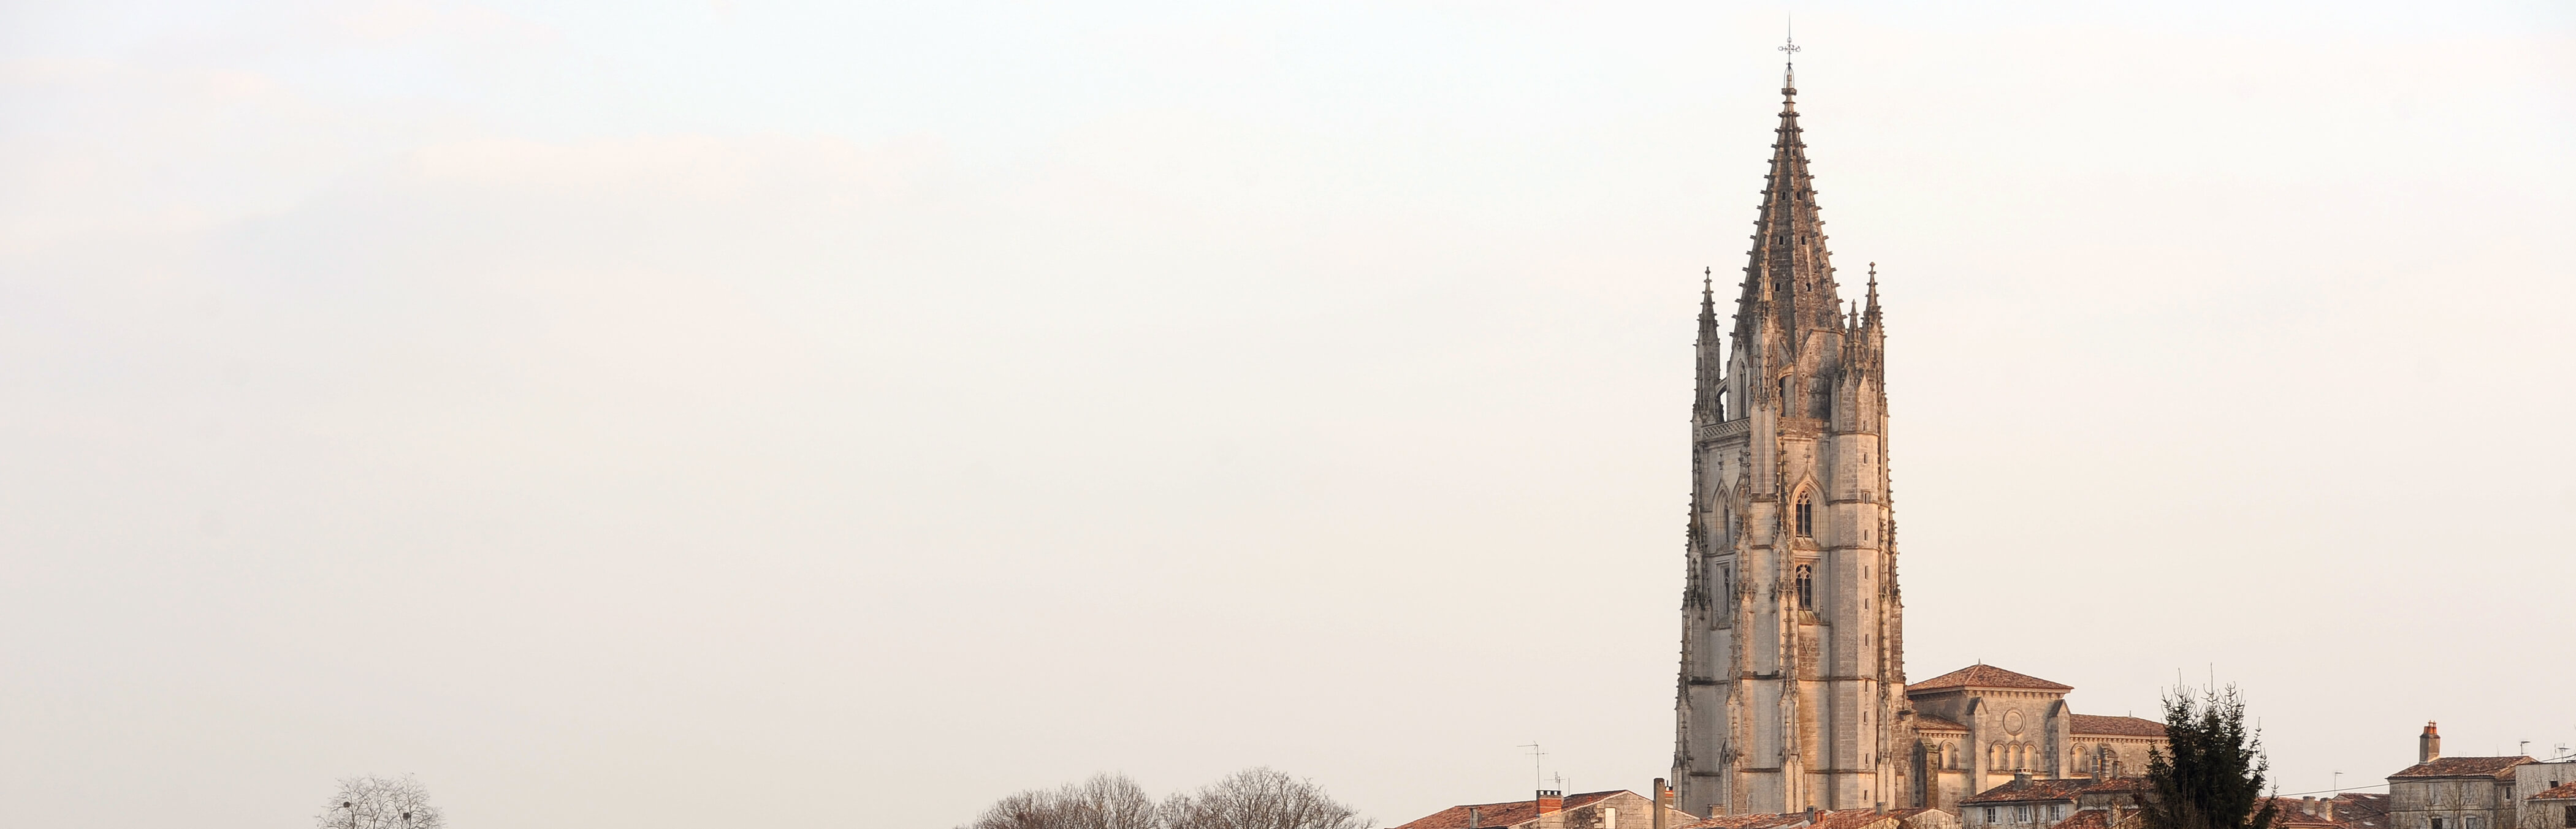 Eglise Saint-Eutrope©ACIR / JJ Gelbart